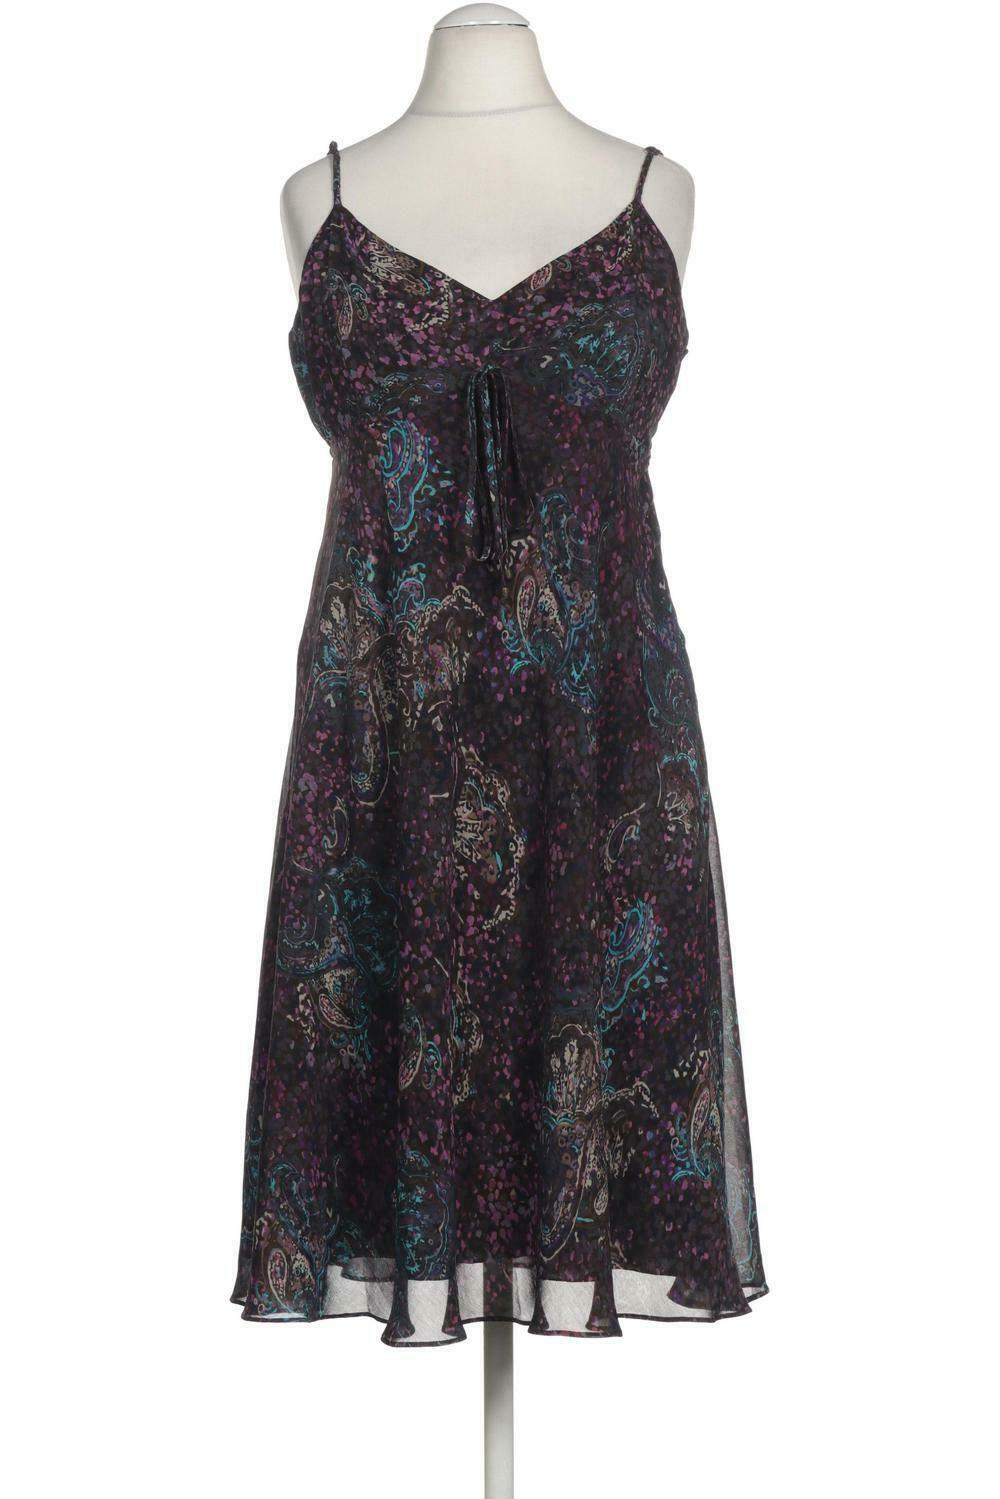 MEXX Kleid Damen Dress Damenkleid Gr. DE 17 kein Etikett lila